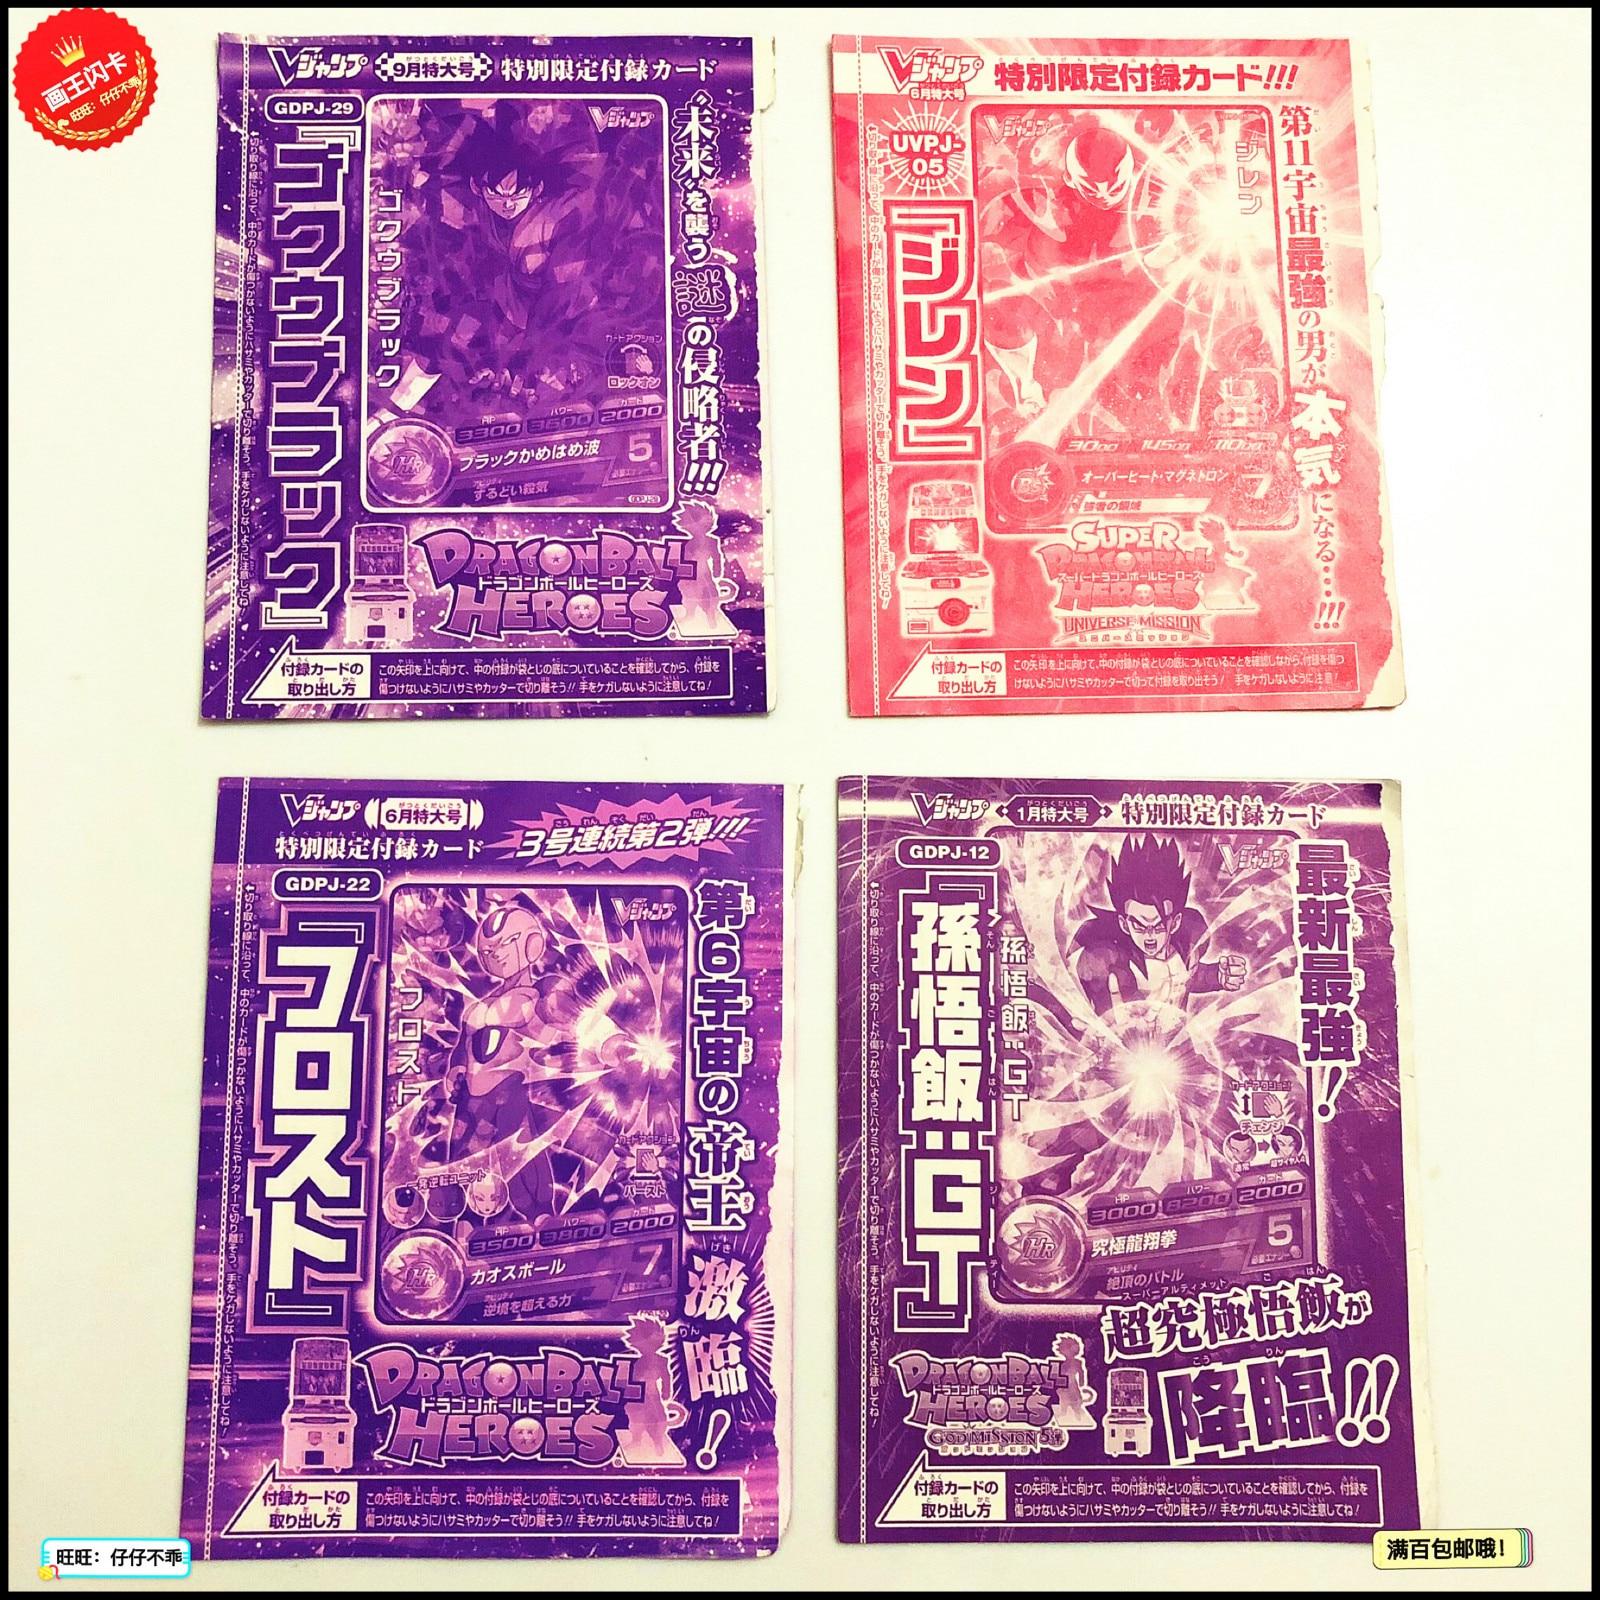 Japan Original Dragon Ball Hero Card GDPJ UVPJ Goku Toys Hobbies Collectibles Game Collection Anime Cards